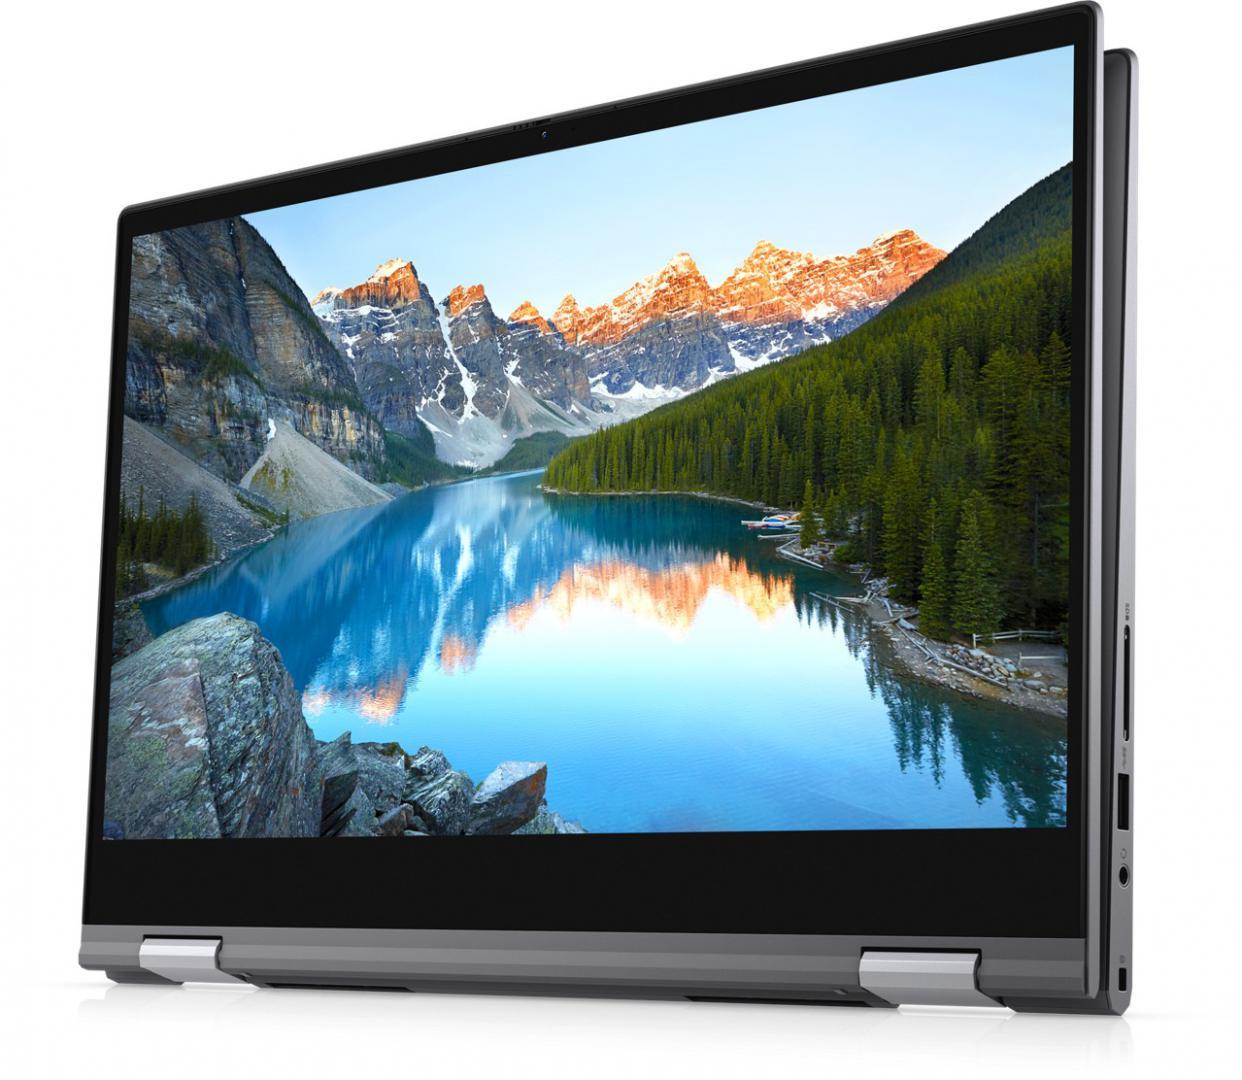 "Laptop Dell Inspiron 5406 2in1, 14.0"" FHD, Touch, i5-1135G7, 8GB, 256GB SSD, Intel Iris Xe Graphics, W10 Pro - imaginea 5"